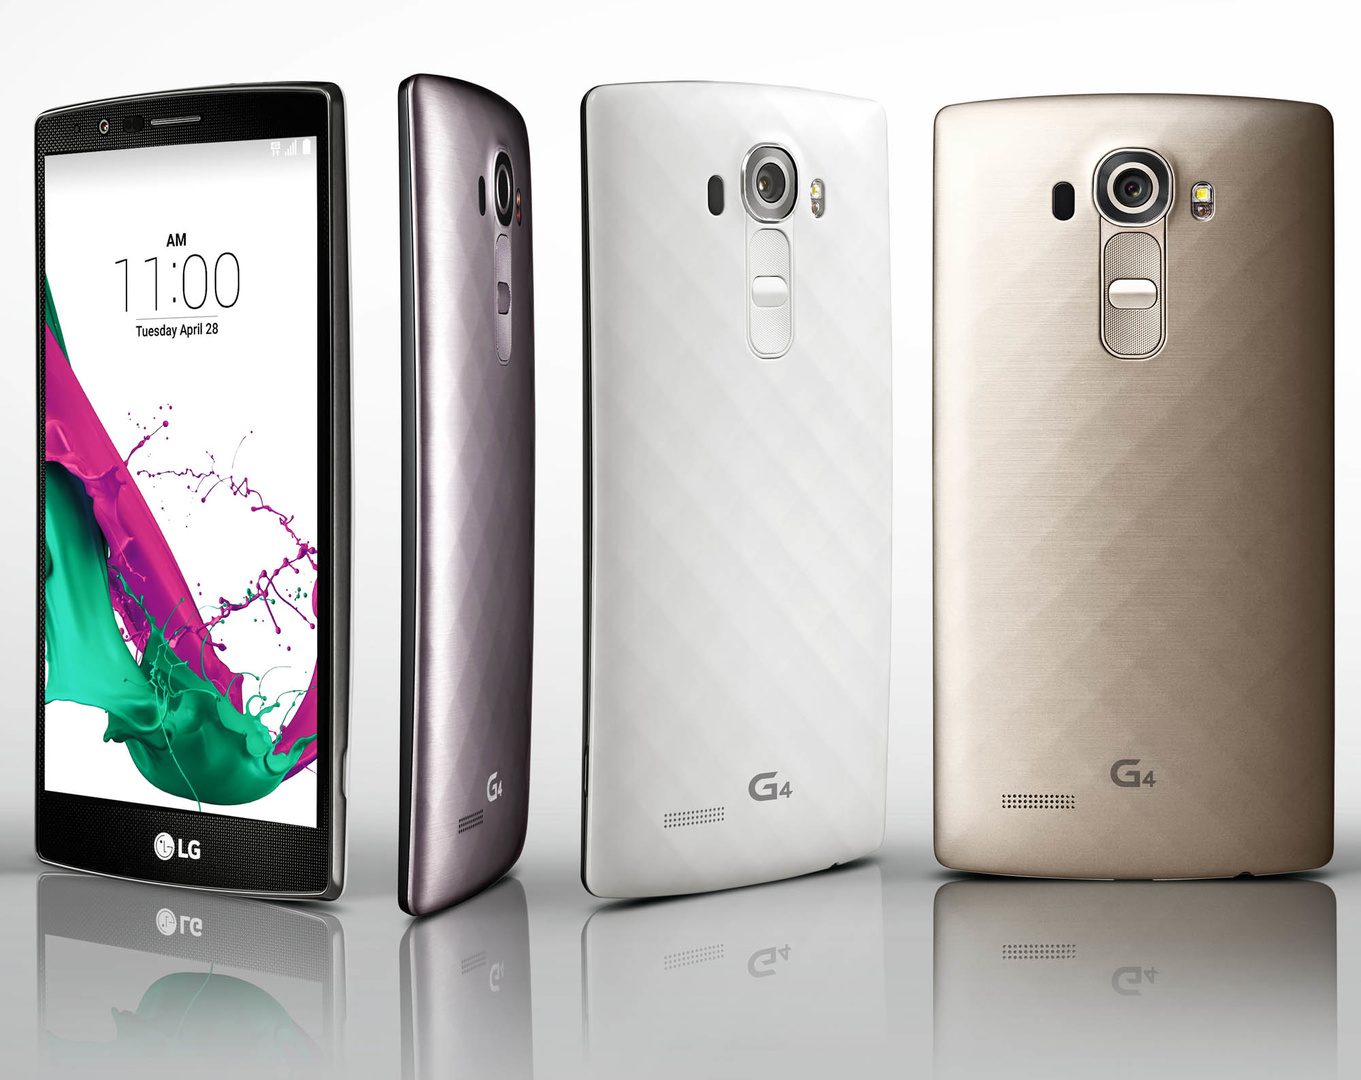 LG G4 mit Rückseite aus Kunststoff